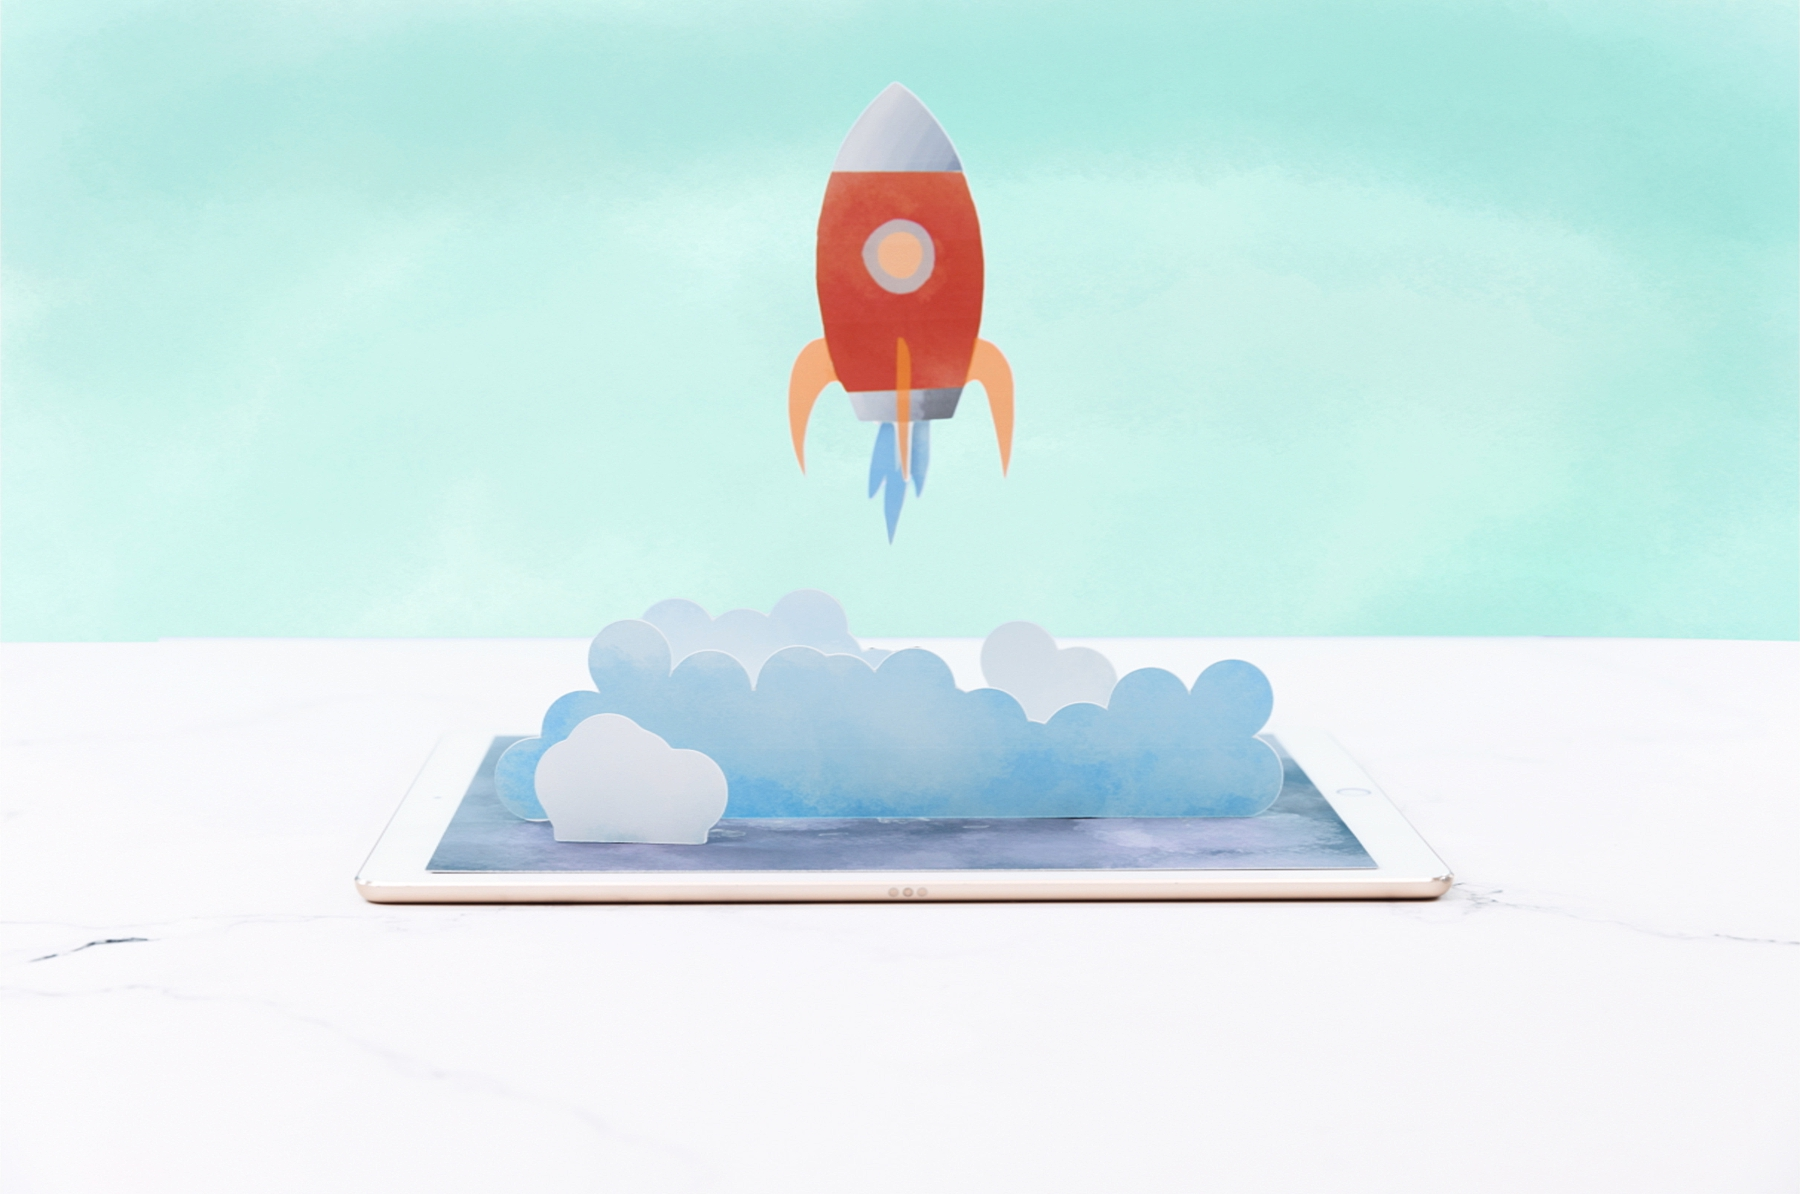 trisha zemp - rocket_WEB.jpg